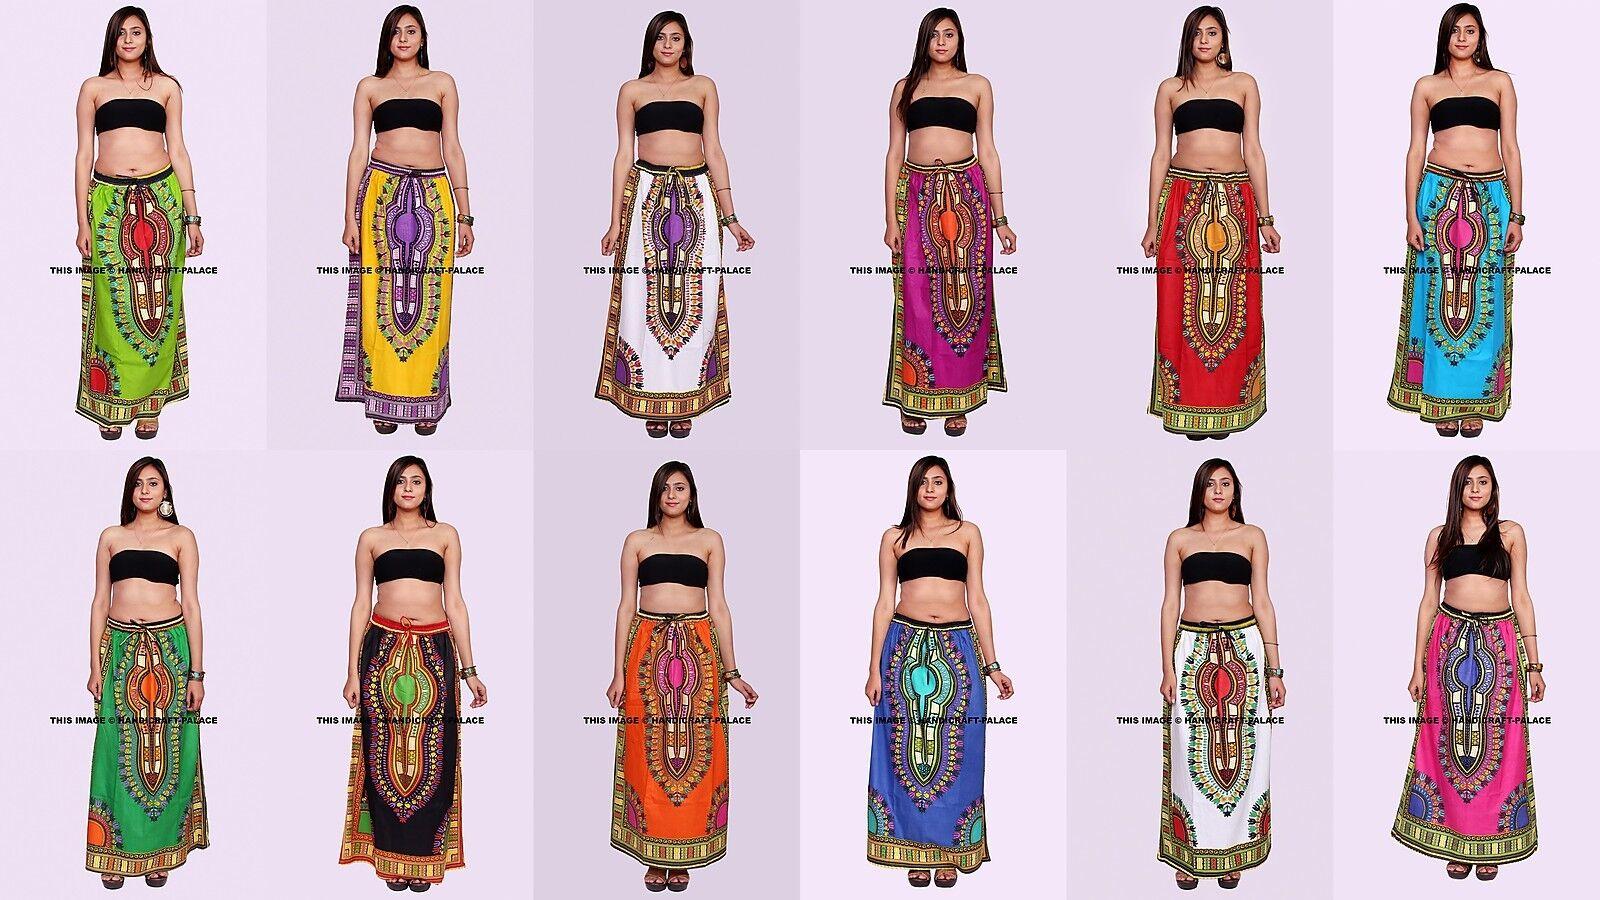 5 PC Grossist Lot Indian Long kjol Dress Kvinnor African Dashiki Hippie Indian